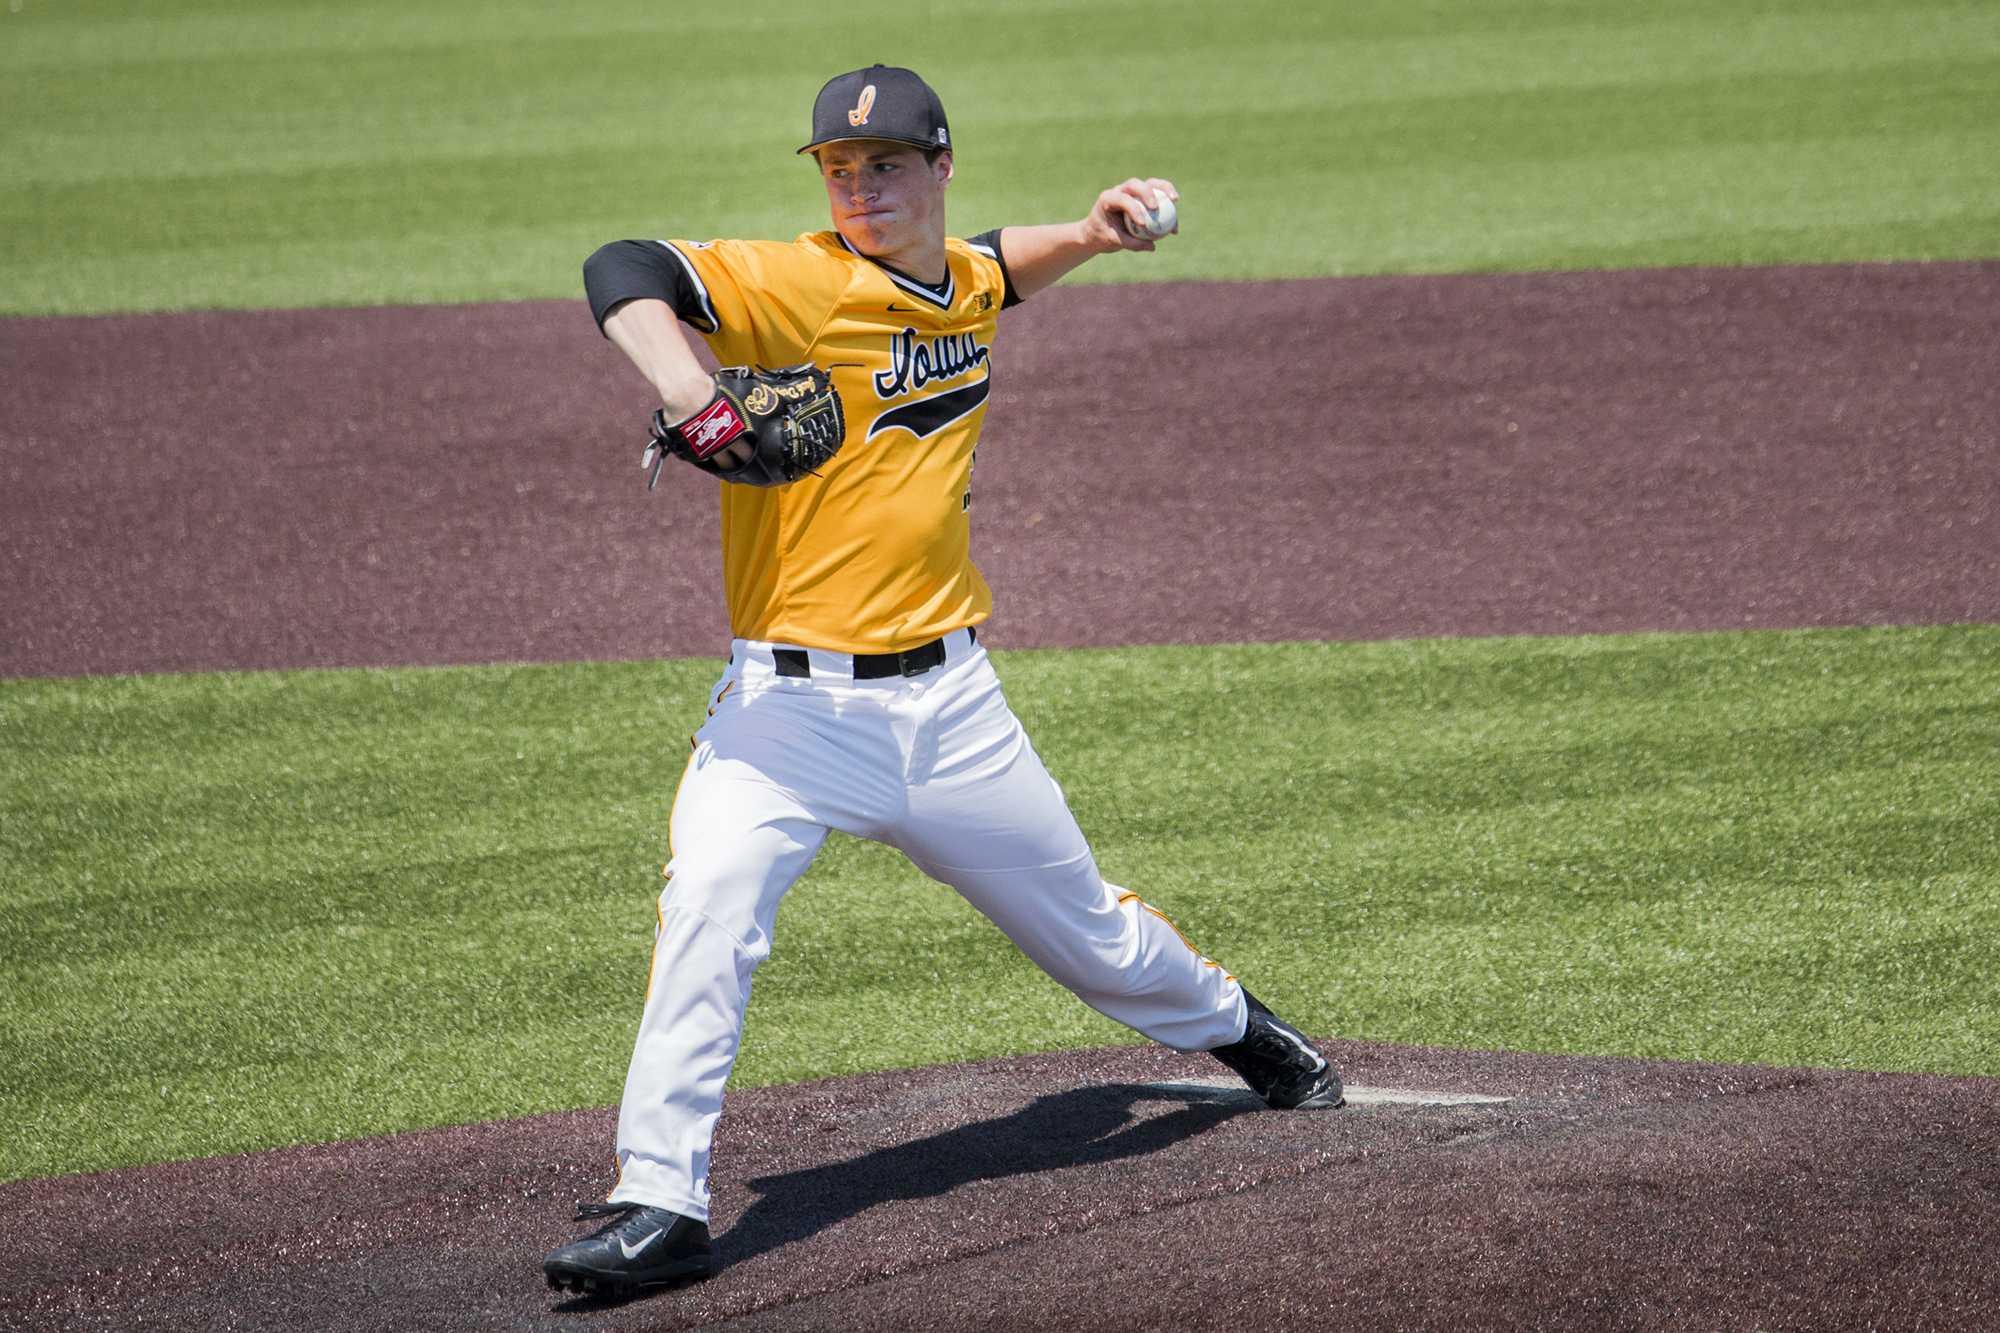 Freshman Jack Dreyer steps up in spotlight